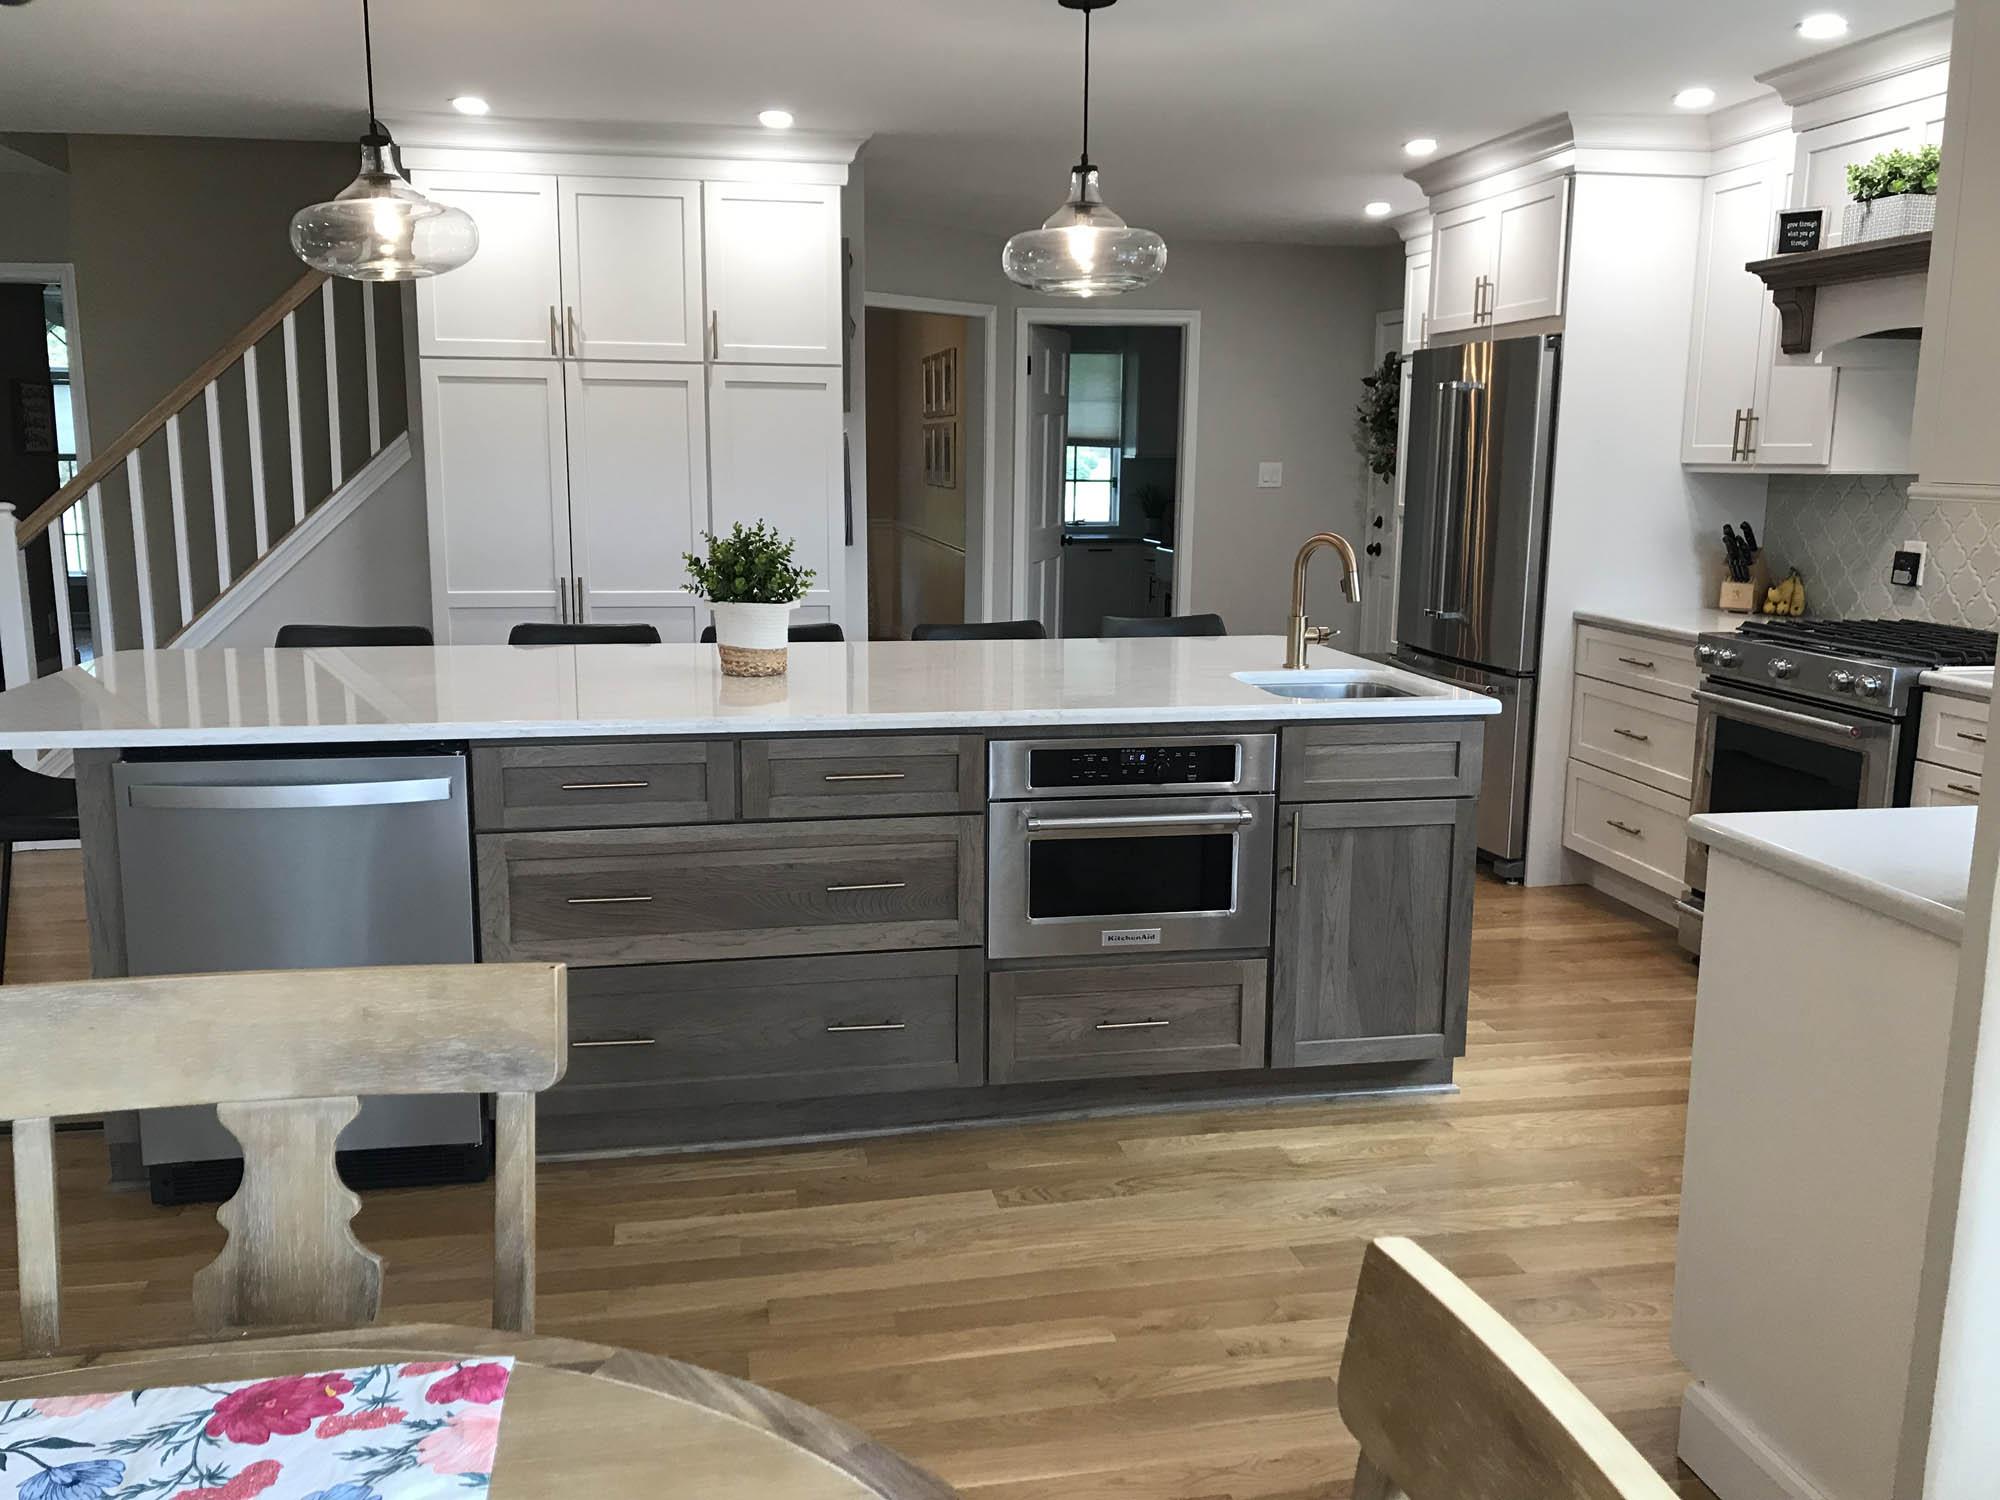 Kitchen & Bathroom Design Ideas and Gallery